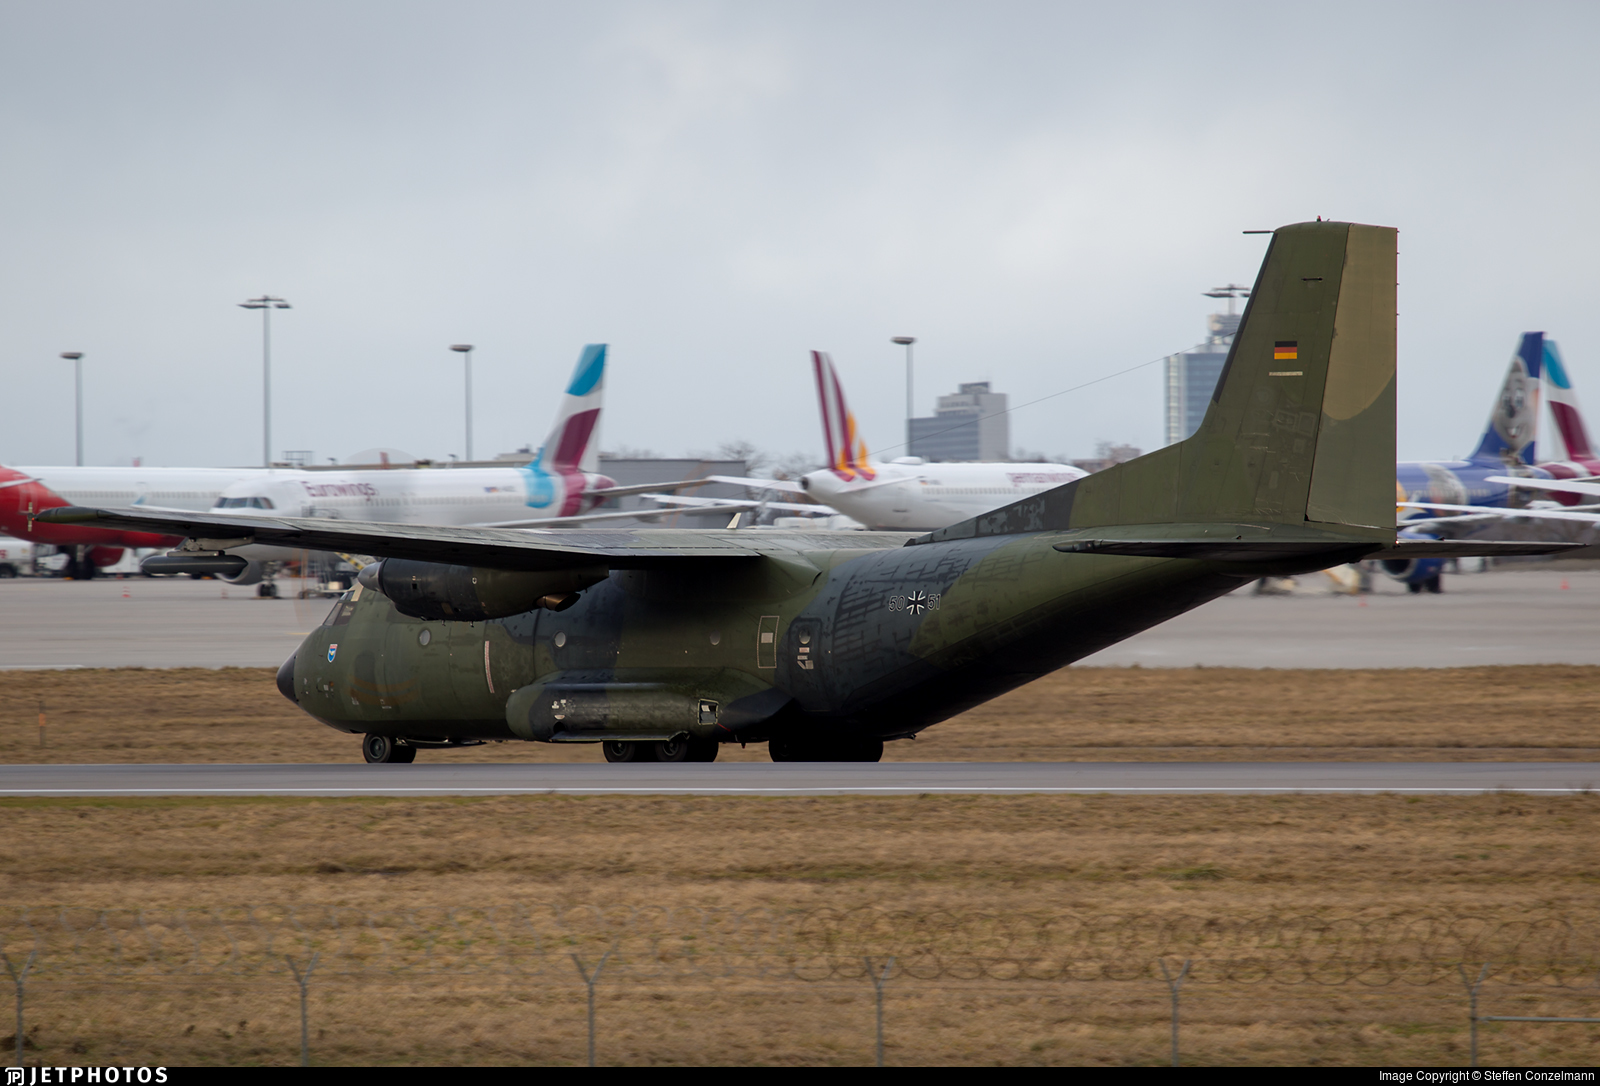 50-51 - Transall C-160D - Germany - Air Force